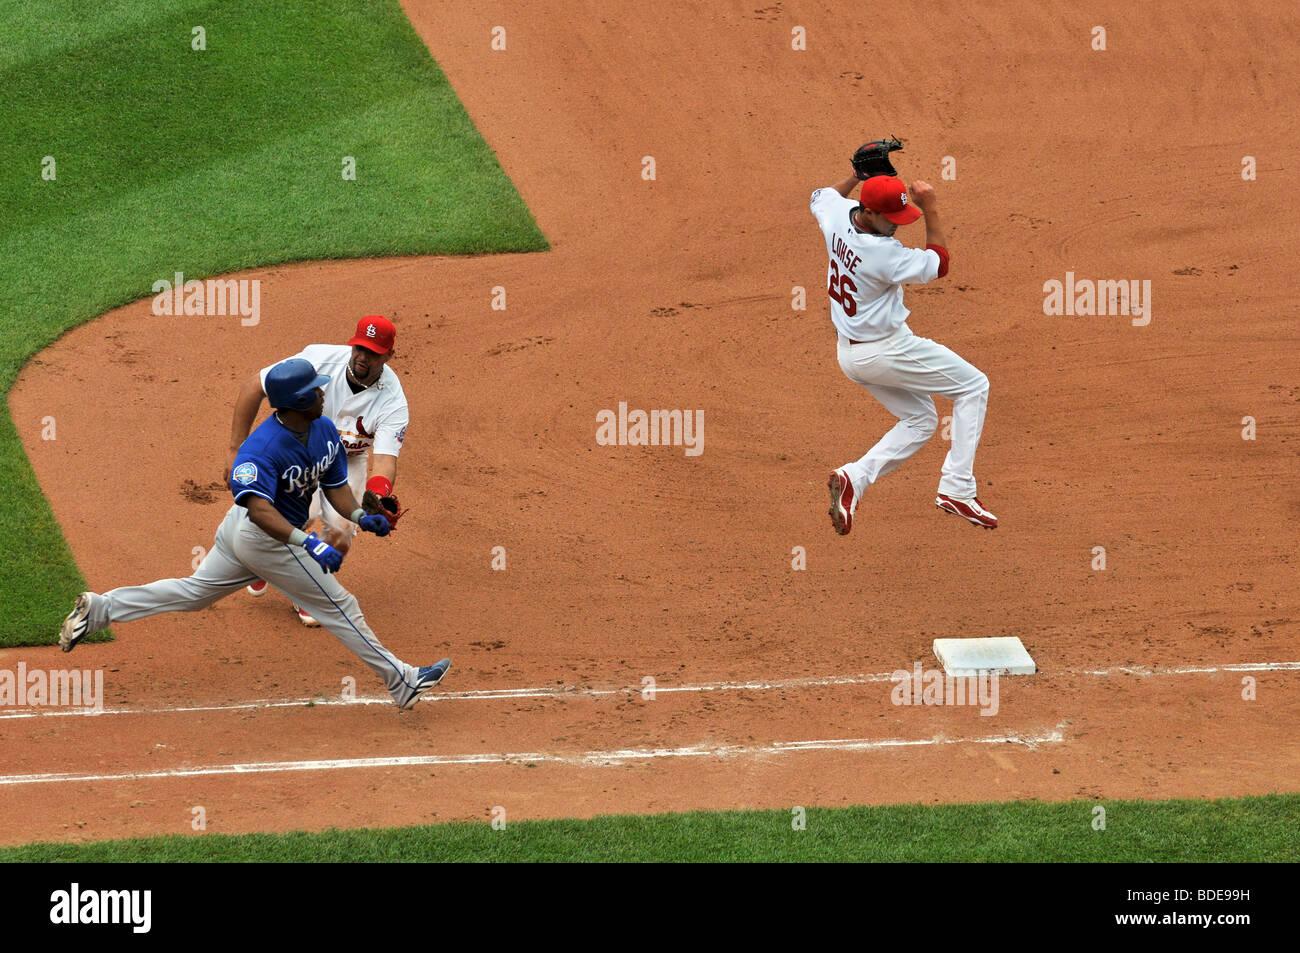 ST LOUIS - MAY 23: Albert Pujols of the Saint Louis Cardinals tags out Jose Guillen of the Kansas City Royals at - Stock Image